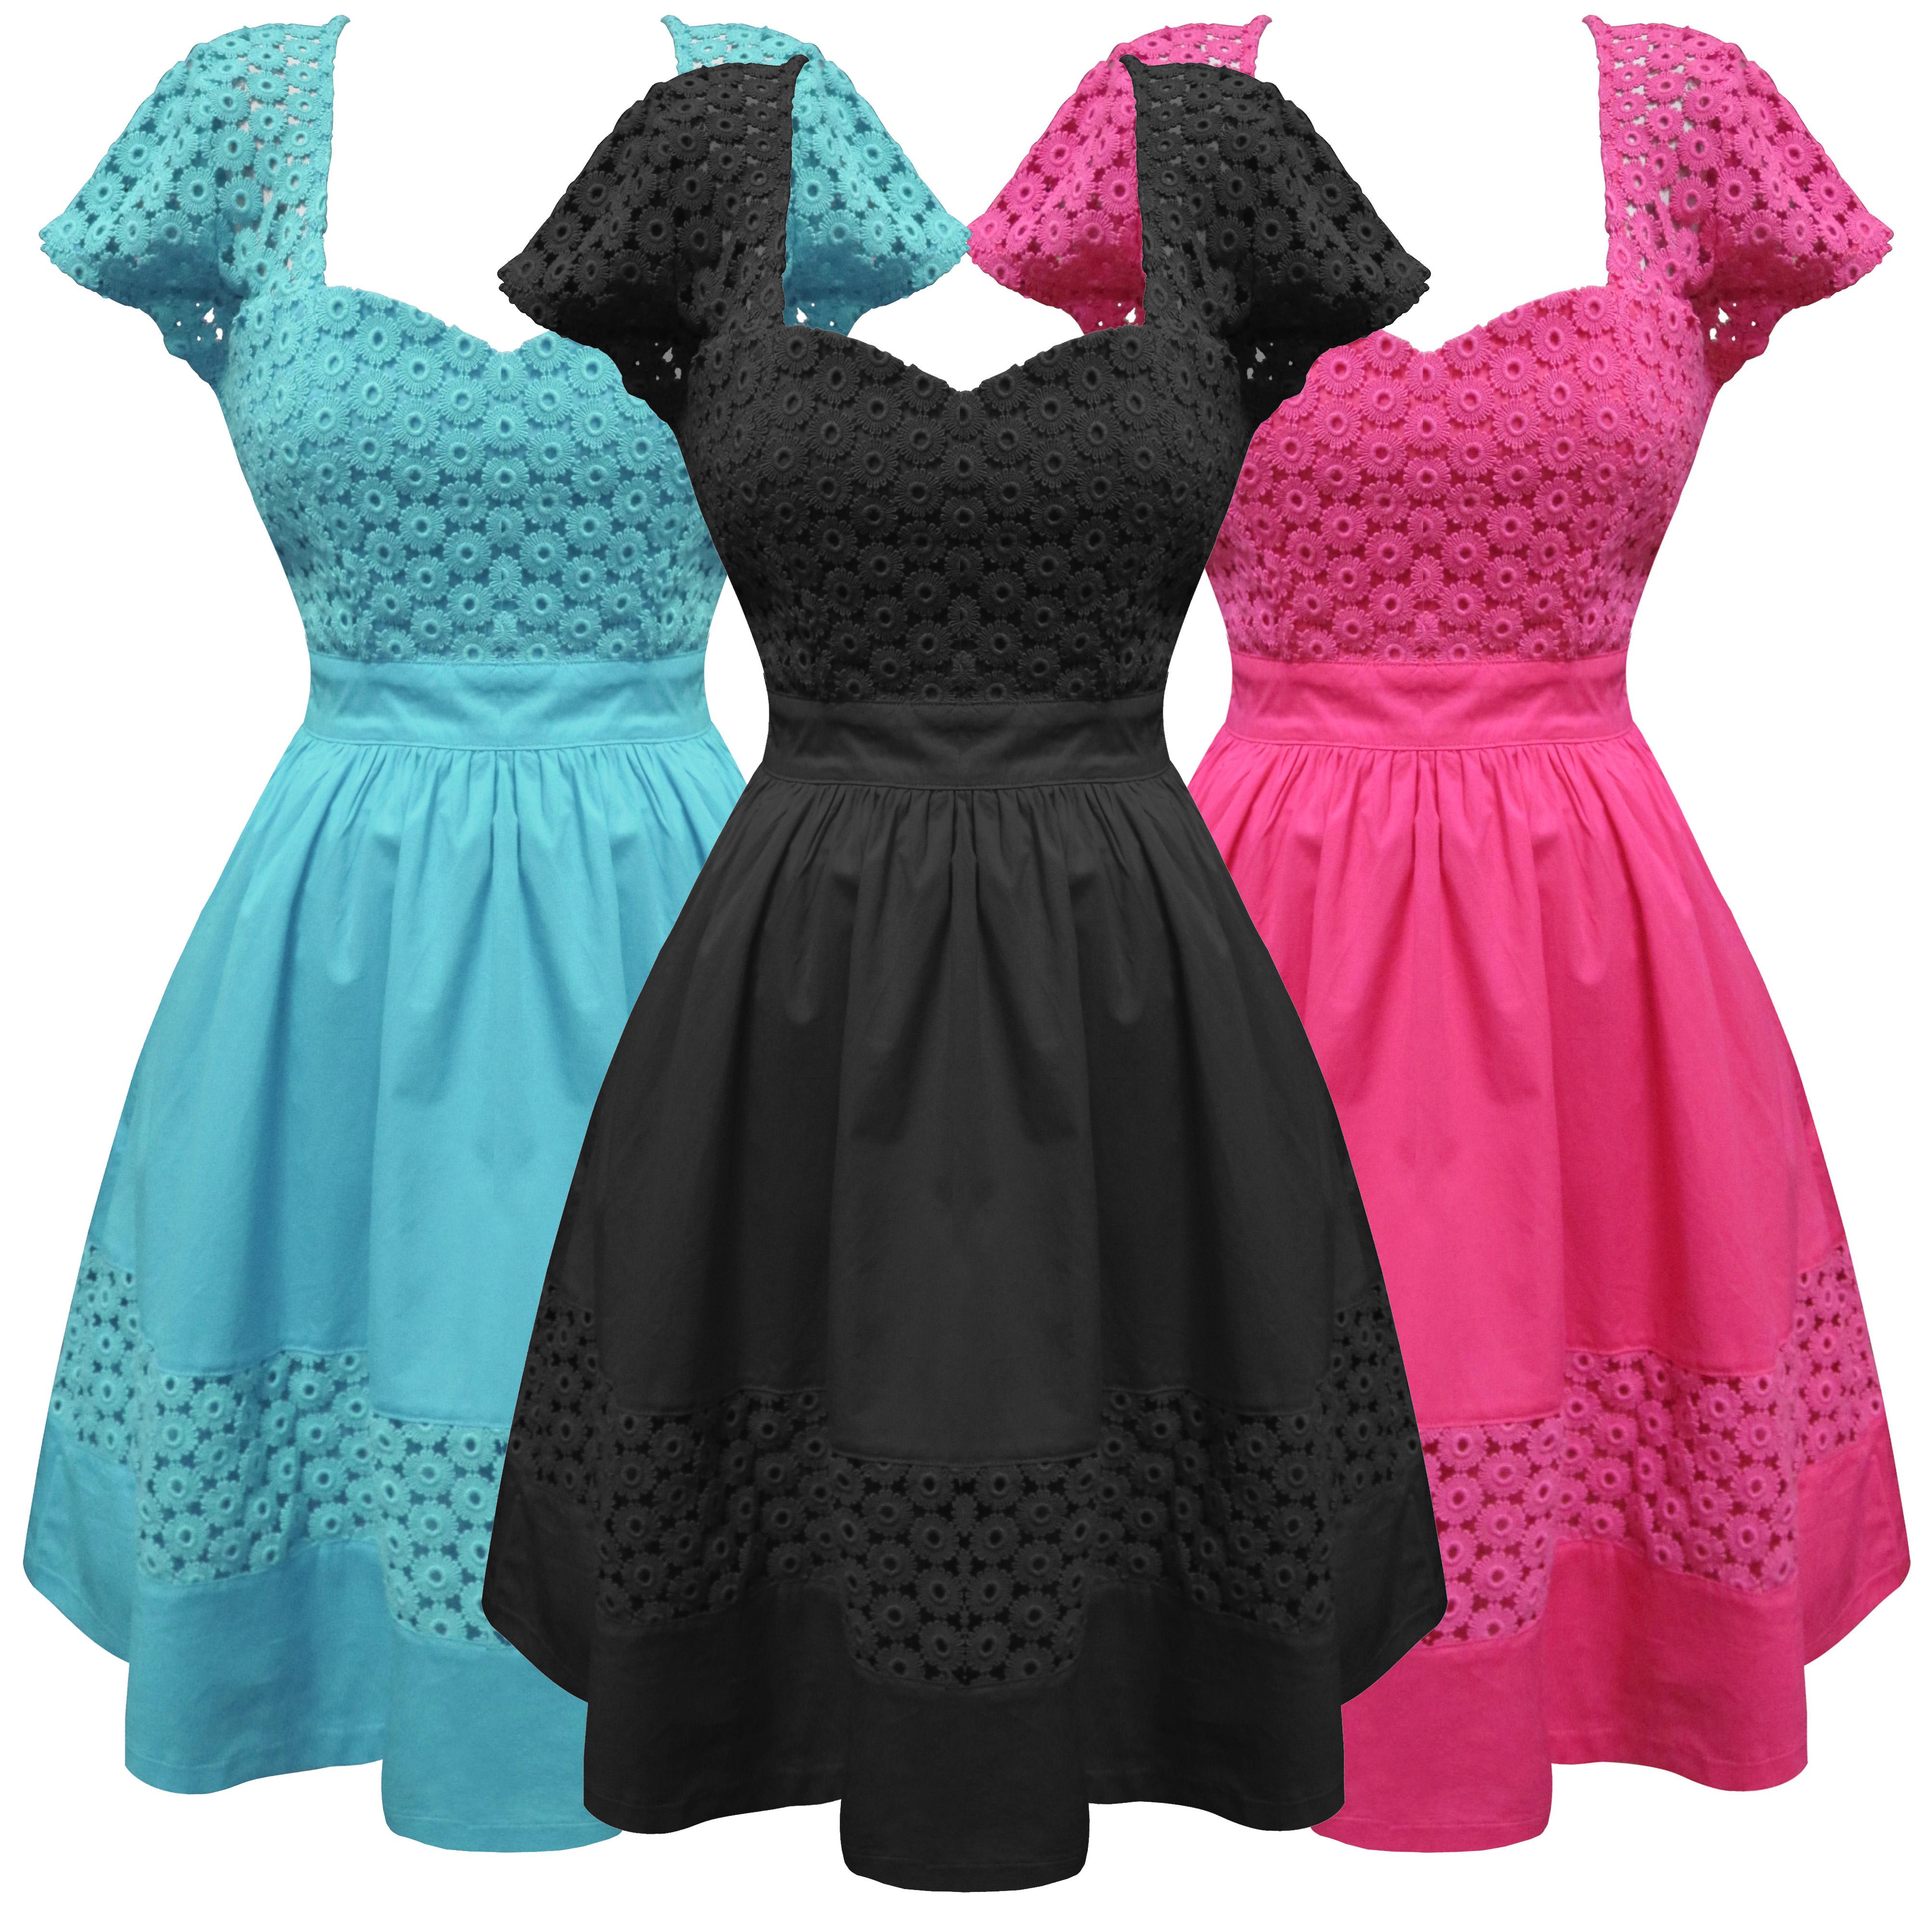 ed8b01b283b 1950s Evening Dresses eBay UK Evening Dresses dressesss